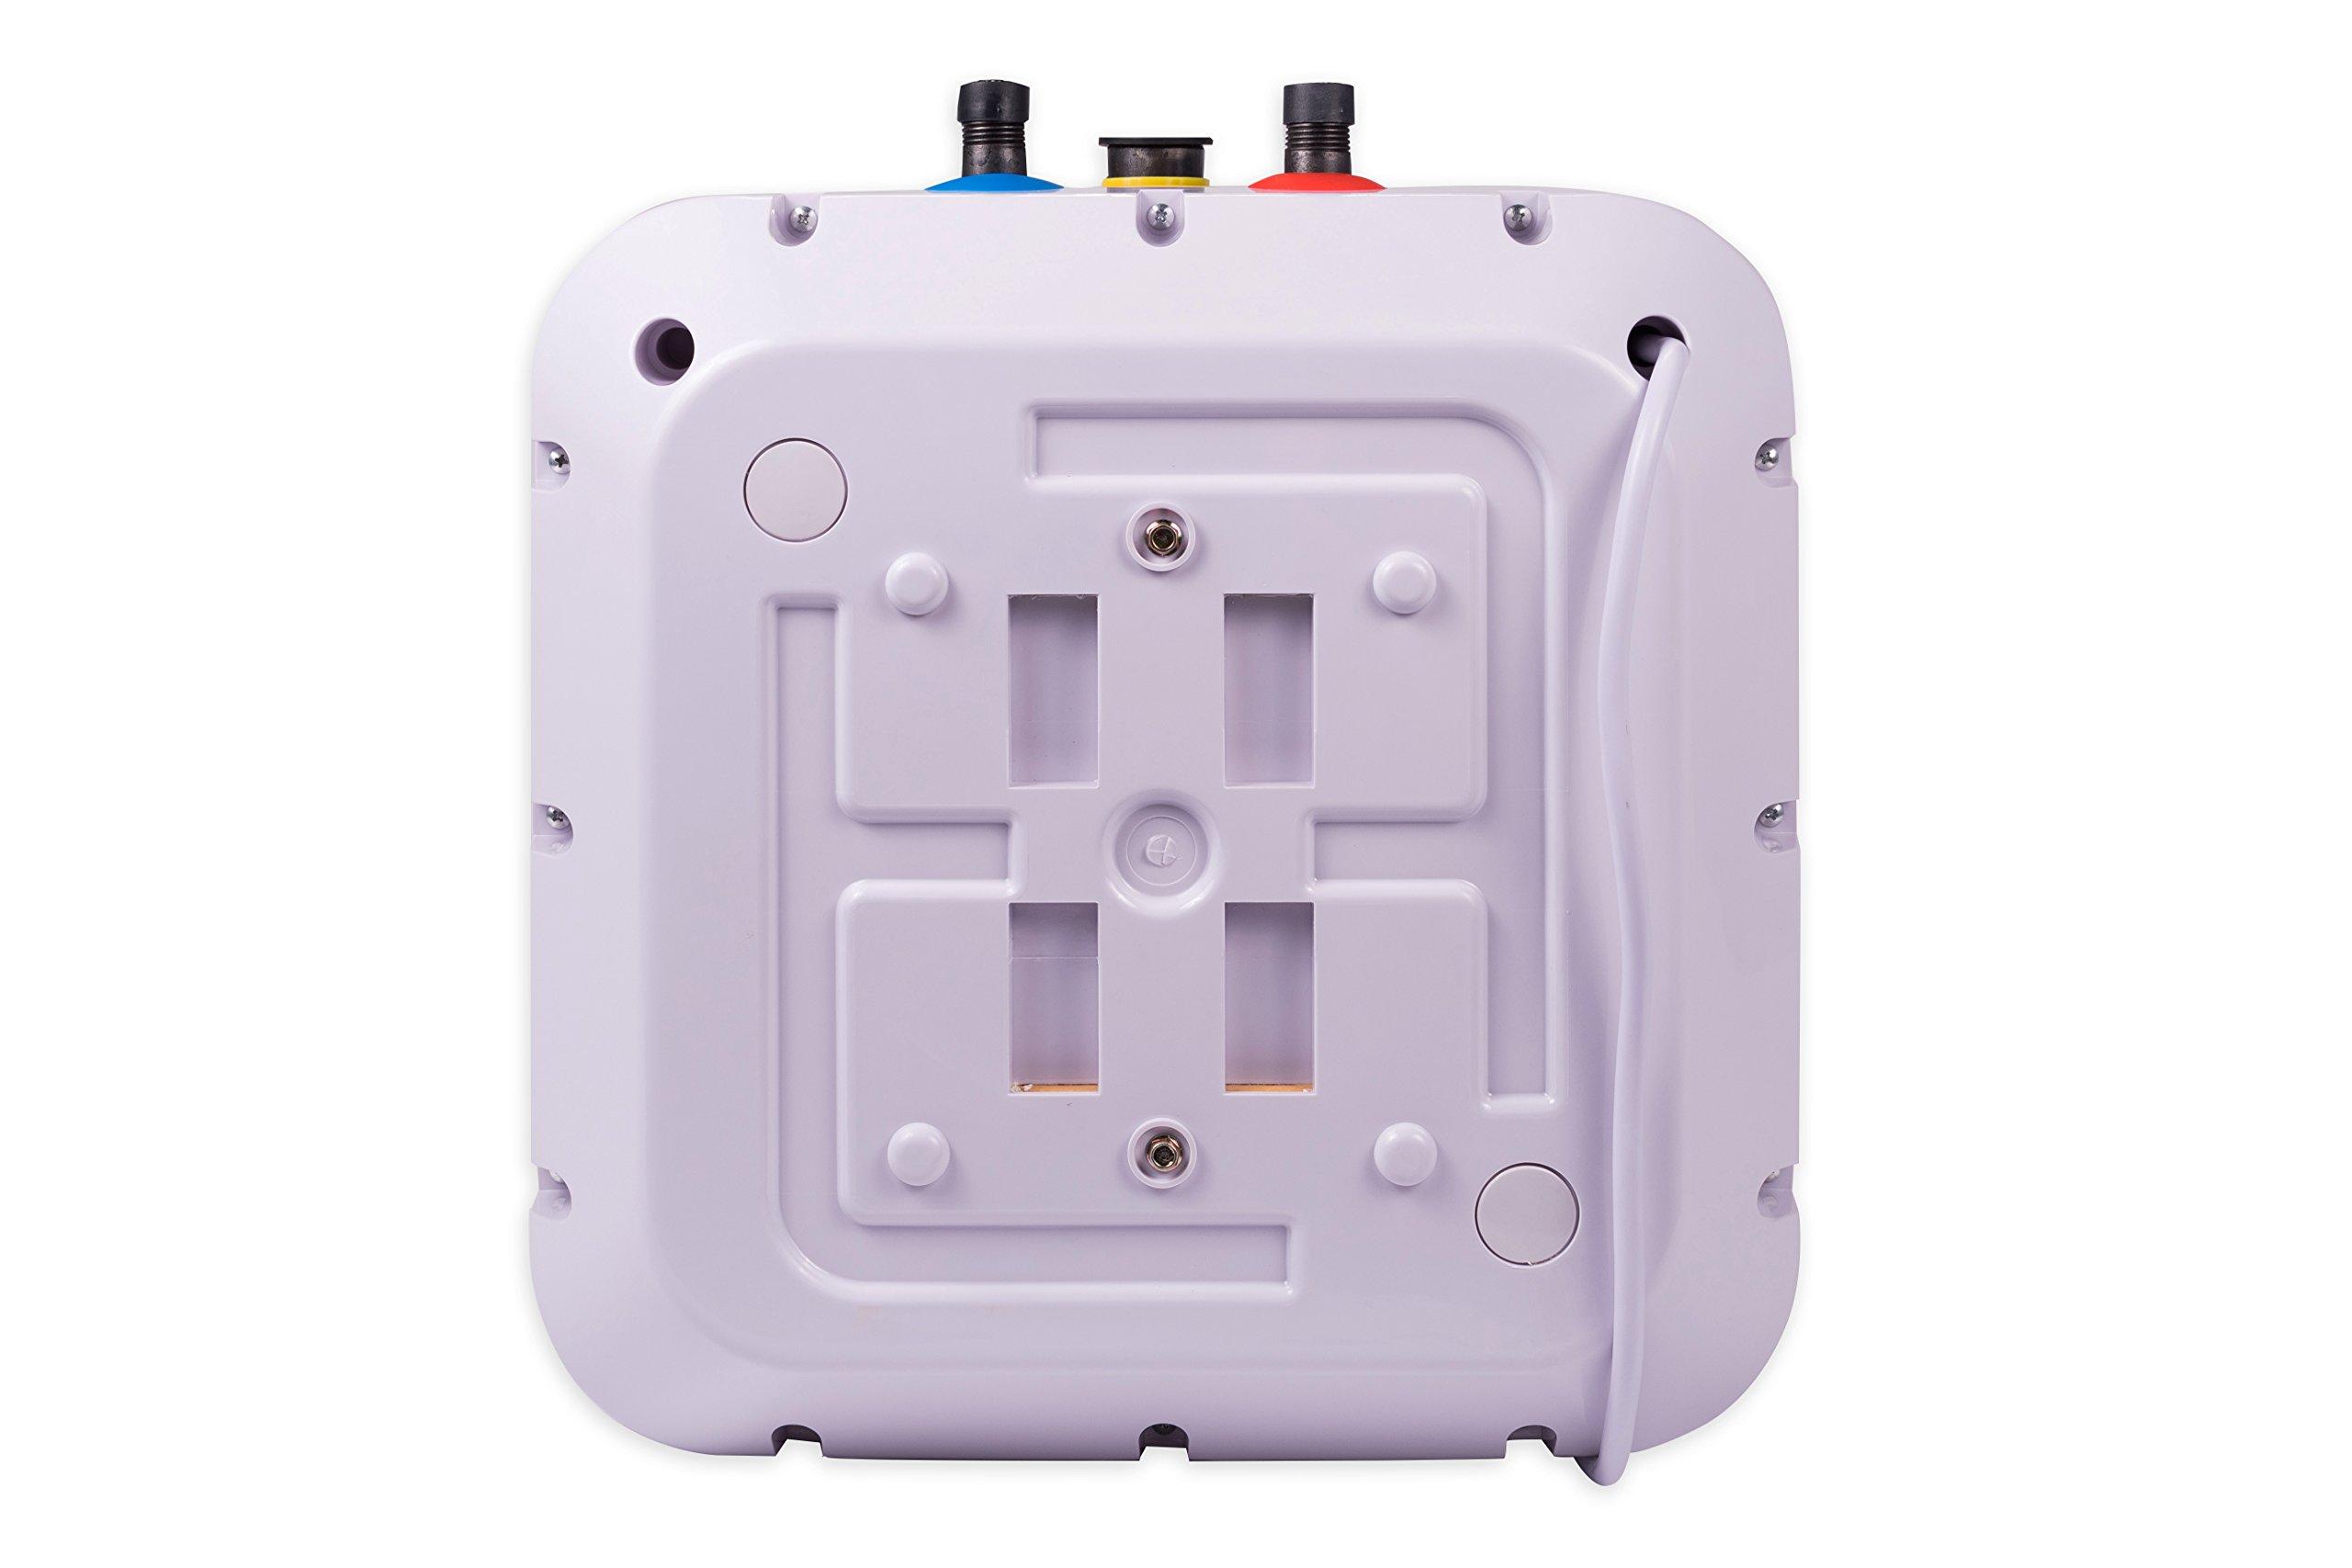 Eccotemp EM-4.0 Electric 4.0-Gallon Mini Tank Water Heater by Eccotemp (Image #1)